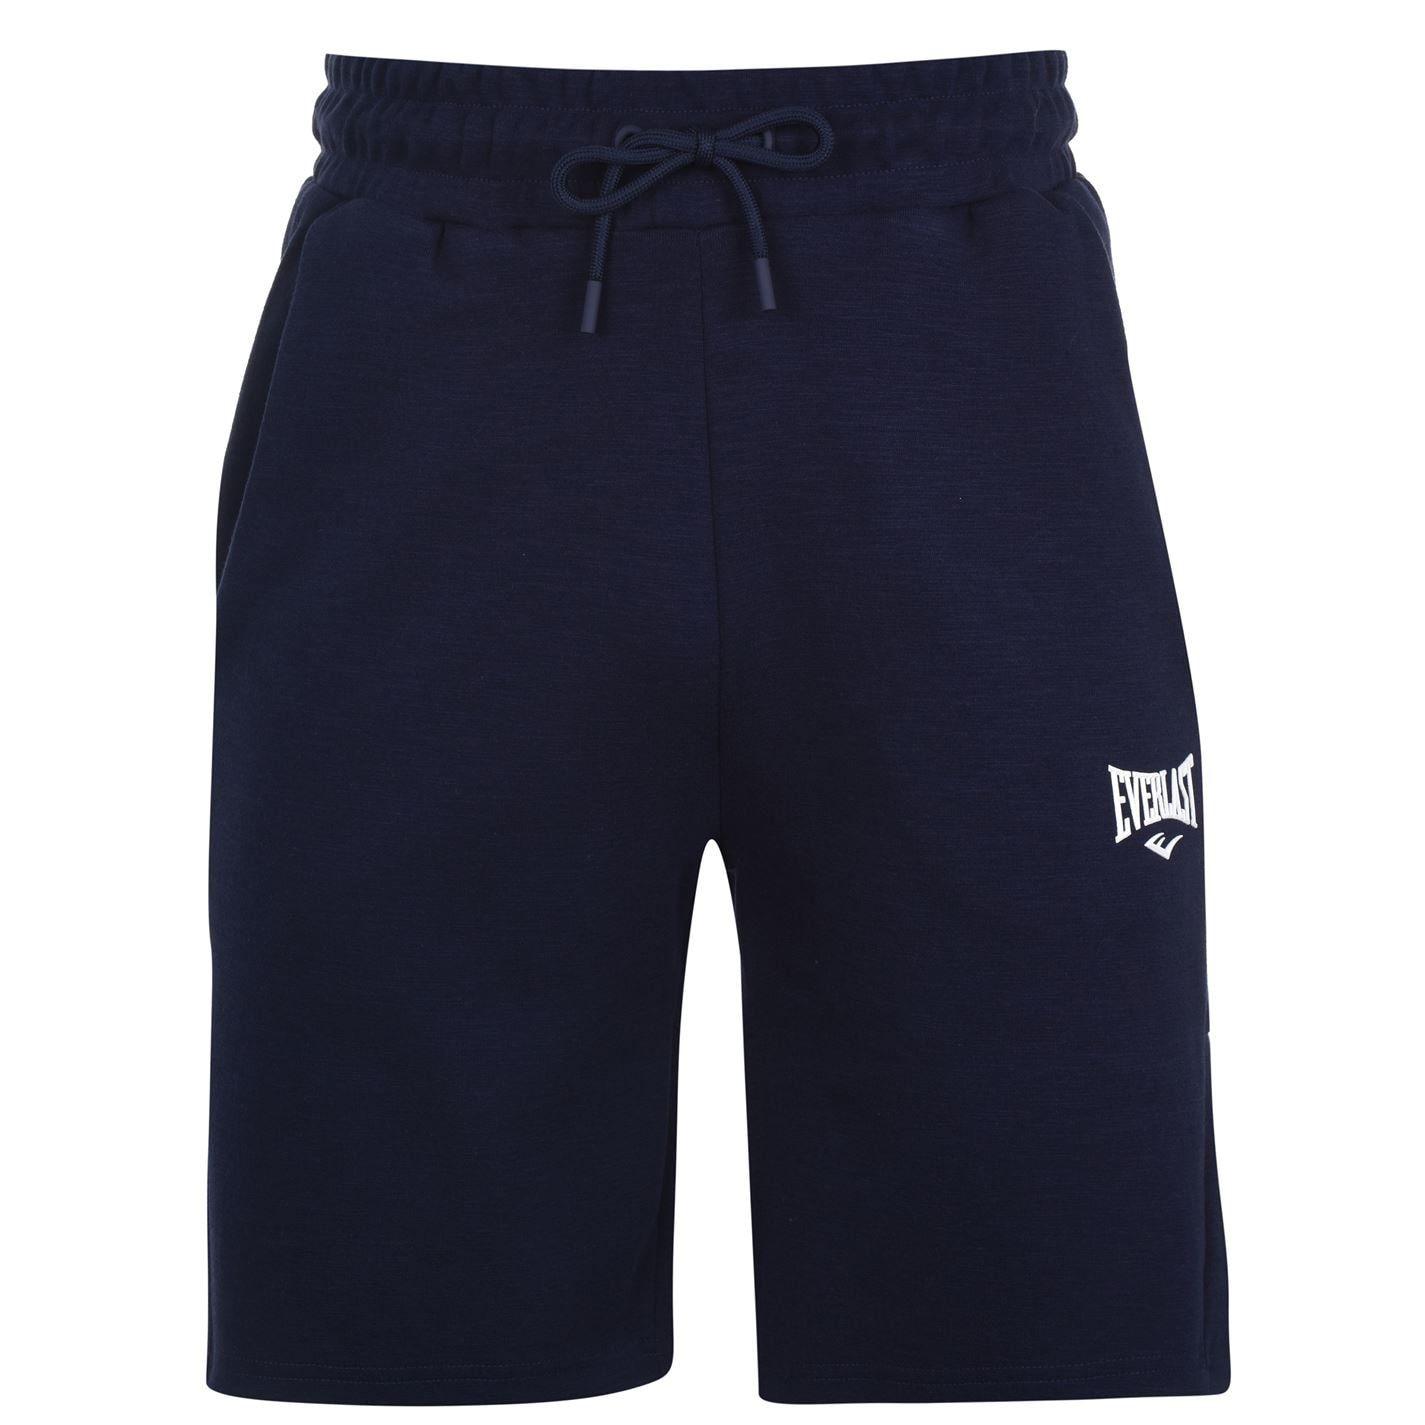 Everlast Mens Fleece Short Shorts Pants Trousers Bottoms Sport Training